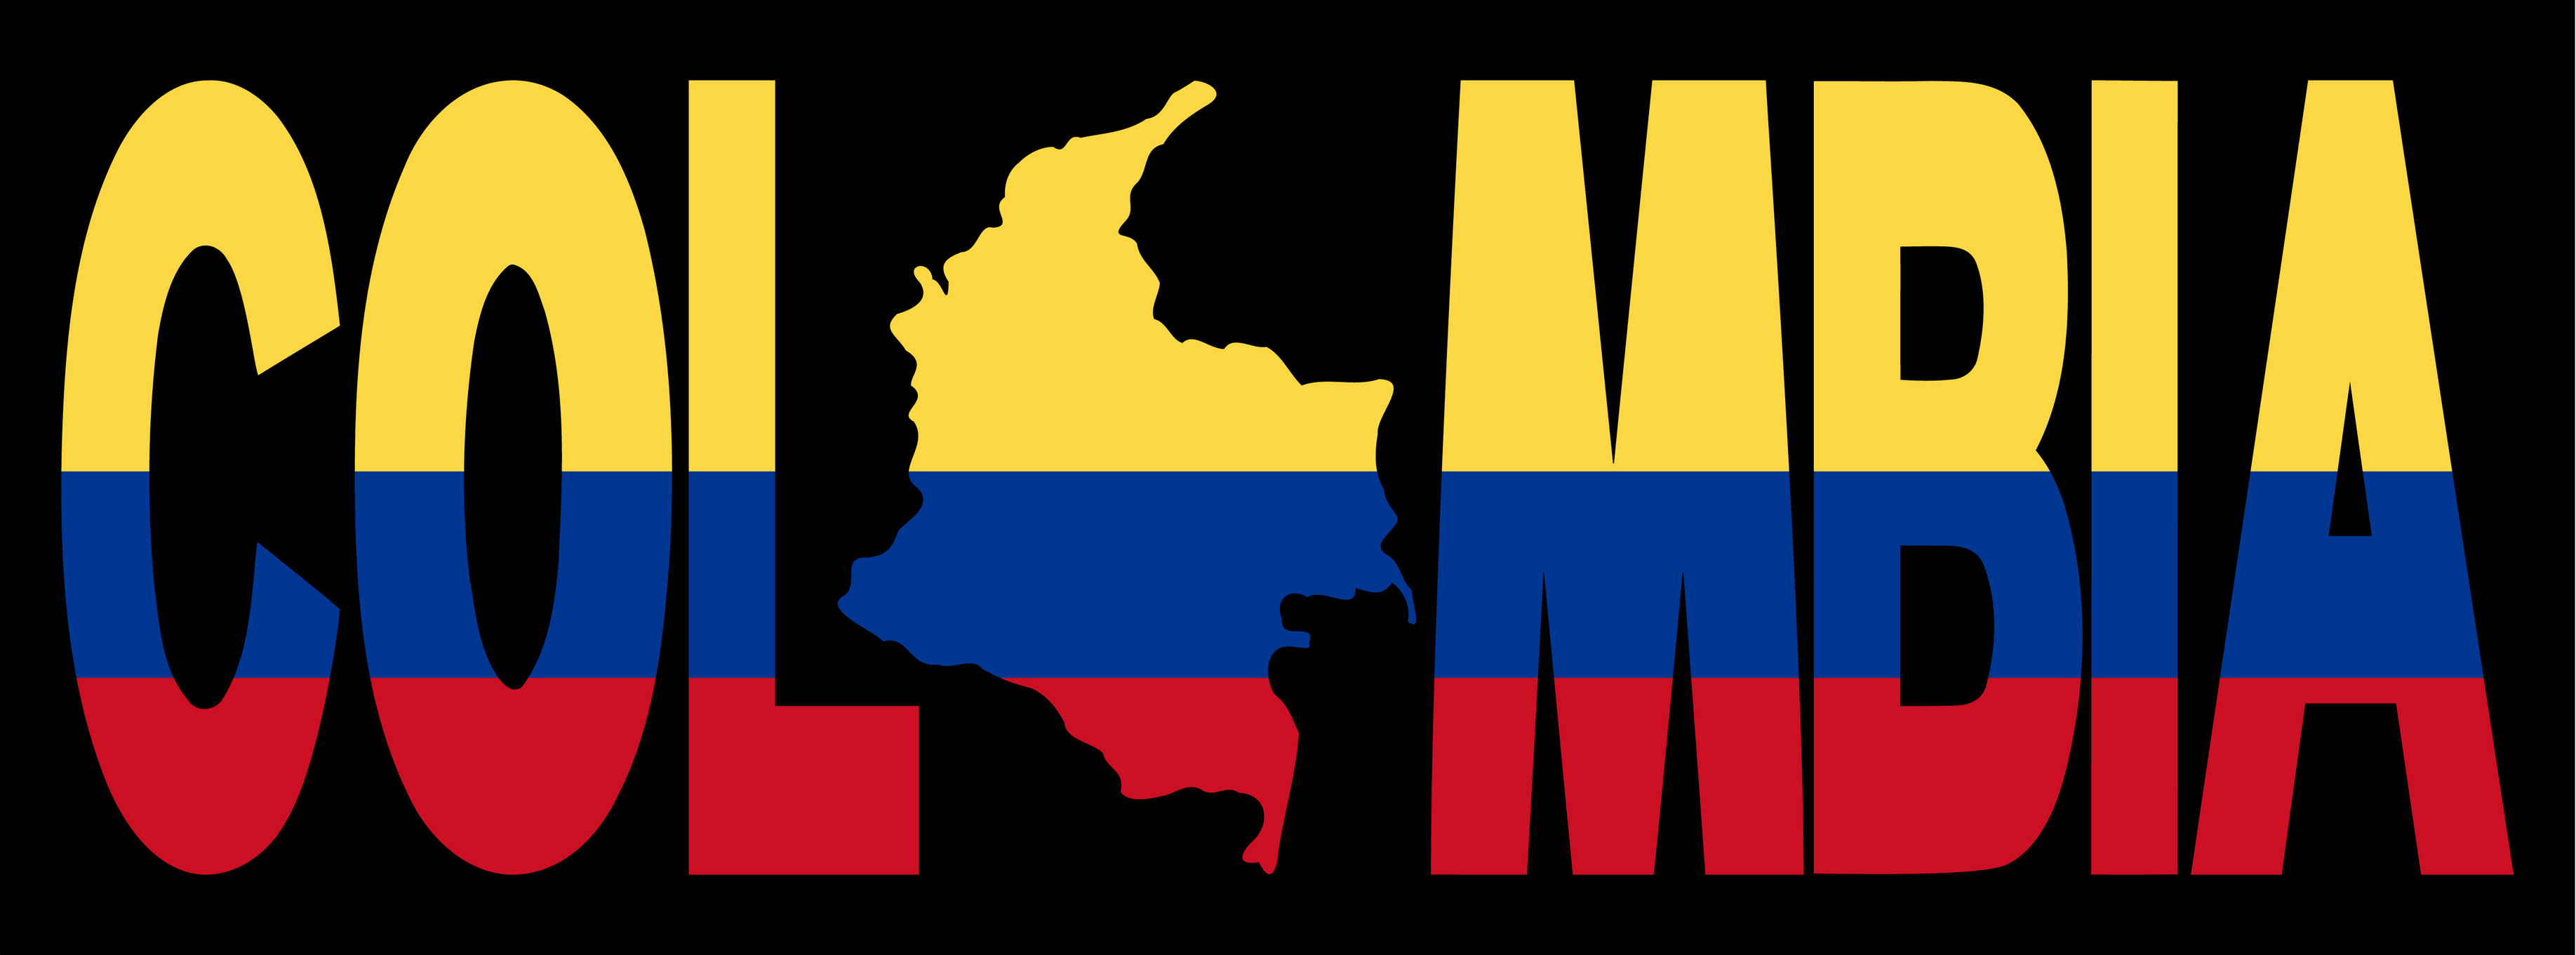 colombiaFLAGname